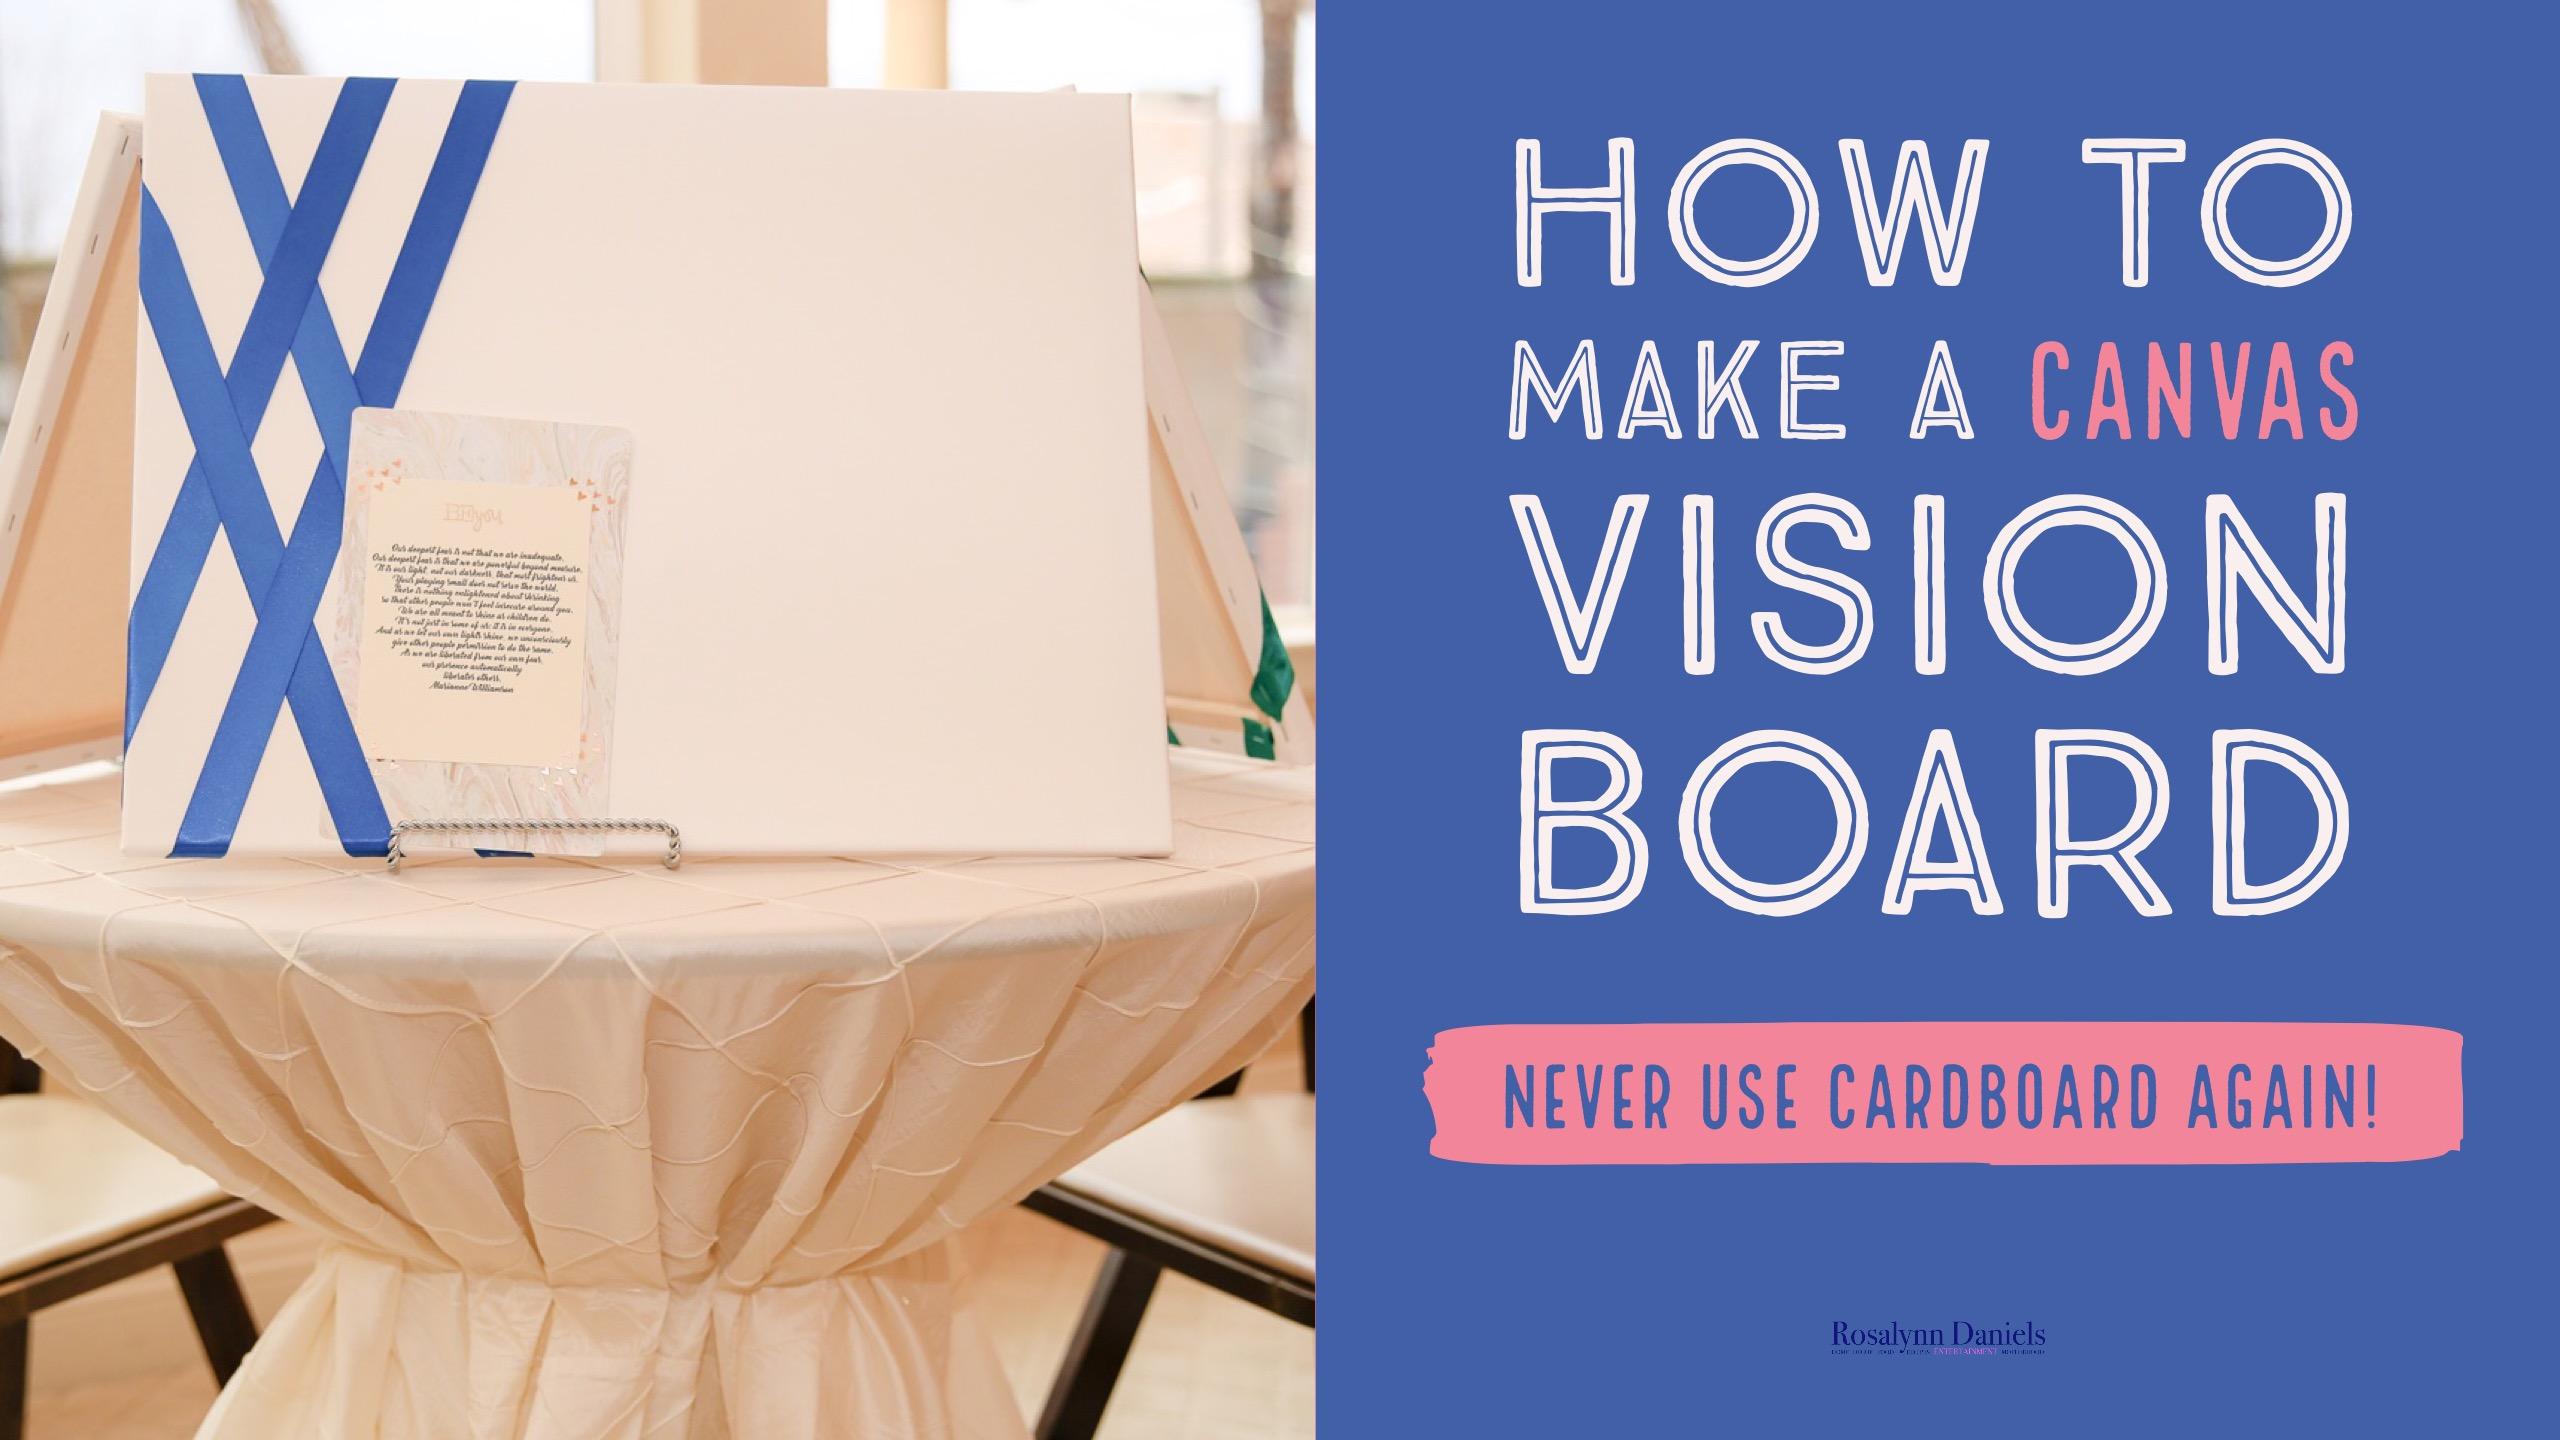 How To Make A Diy Canvas Vision Board Rosalynn Daniels